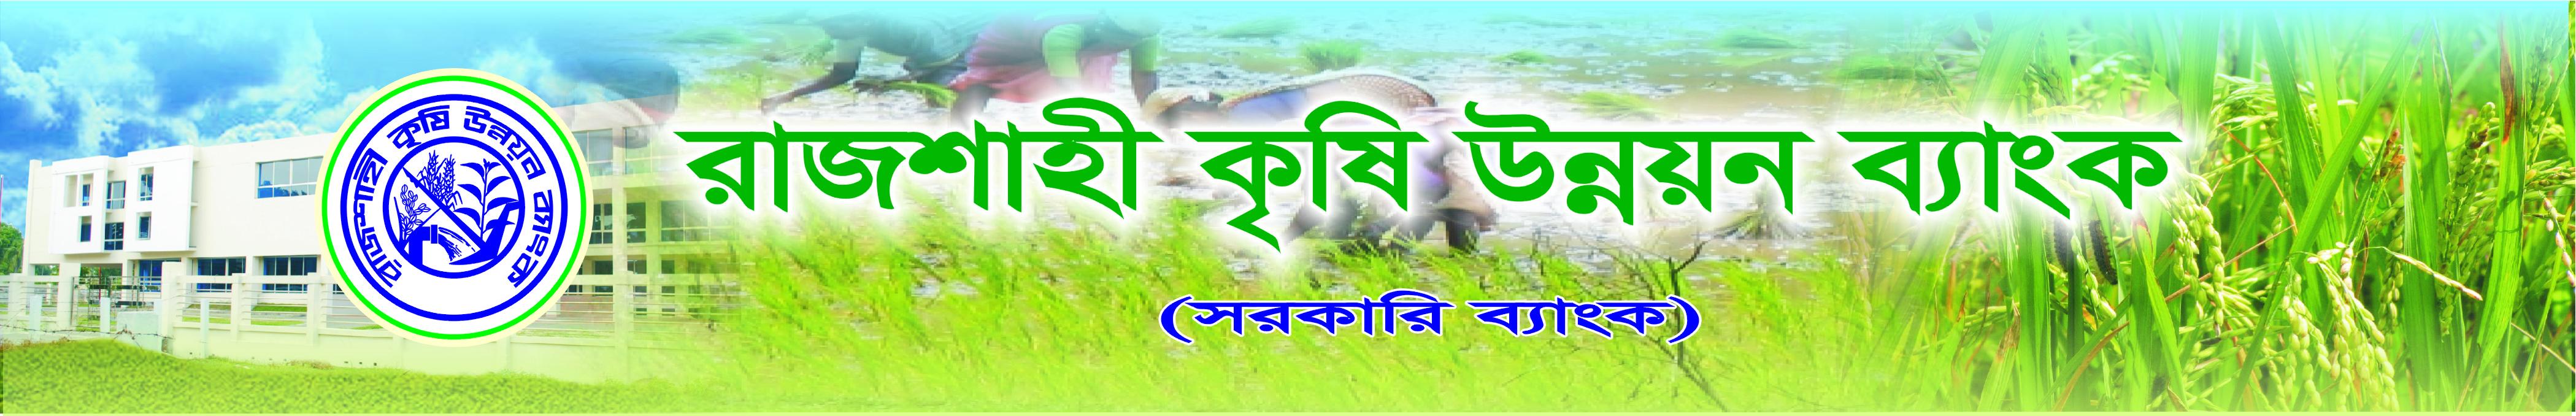 Rajshahi Krishi Unnayan Bank (RAKUB)